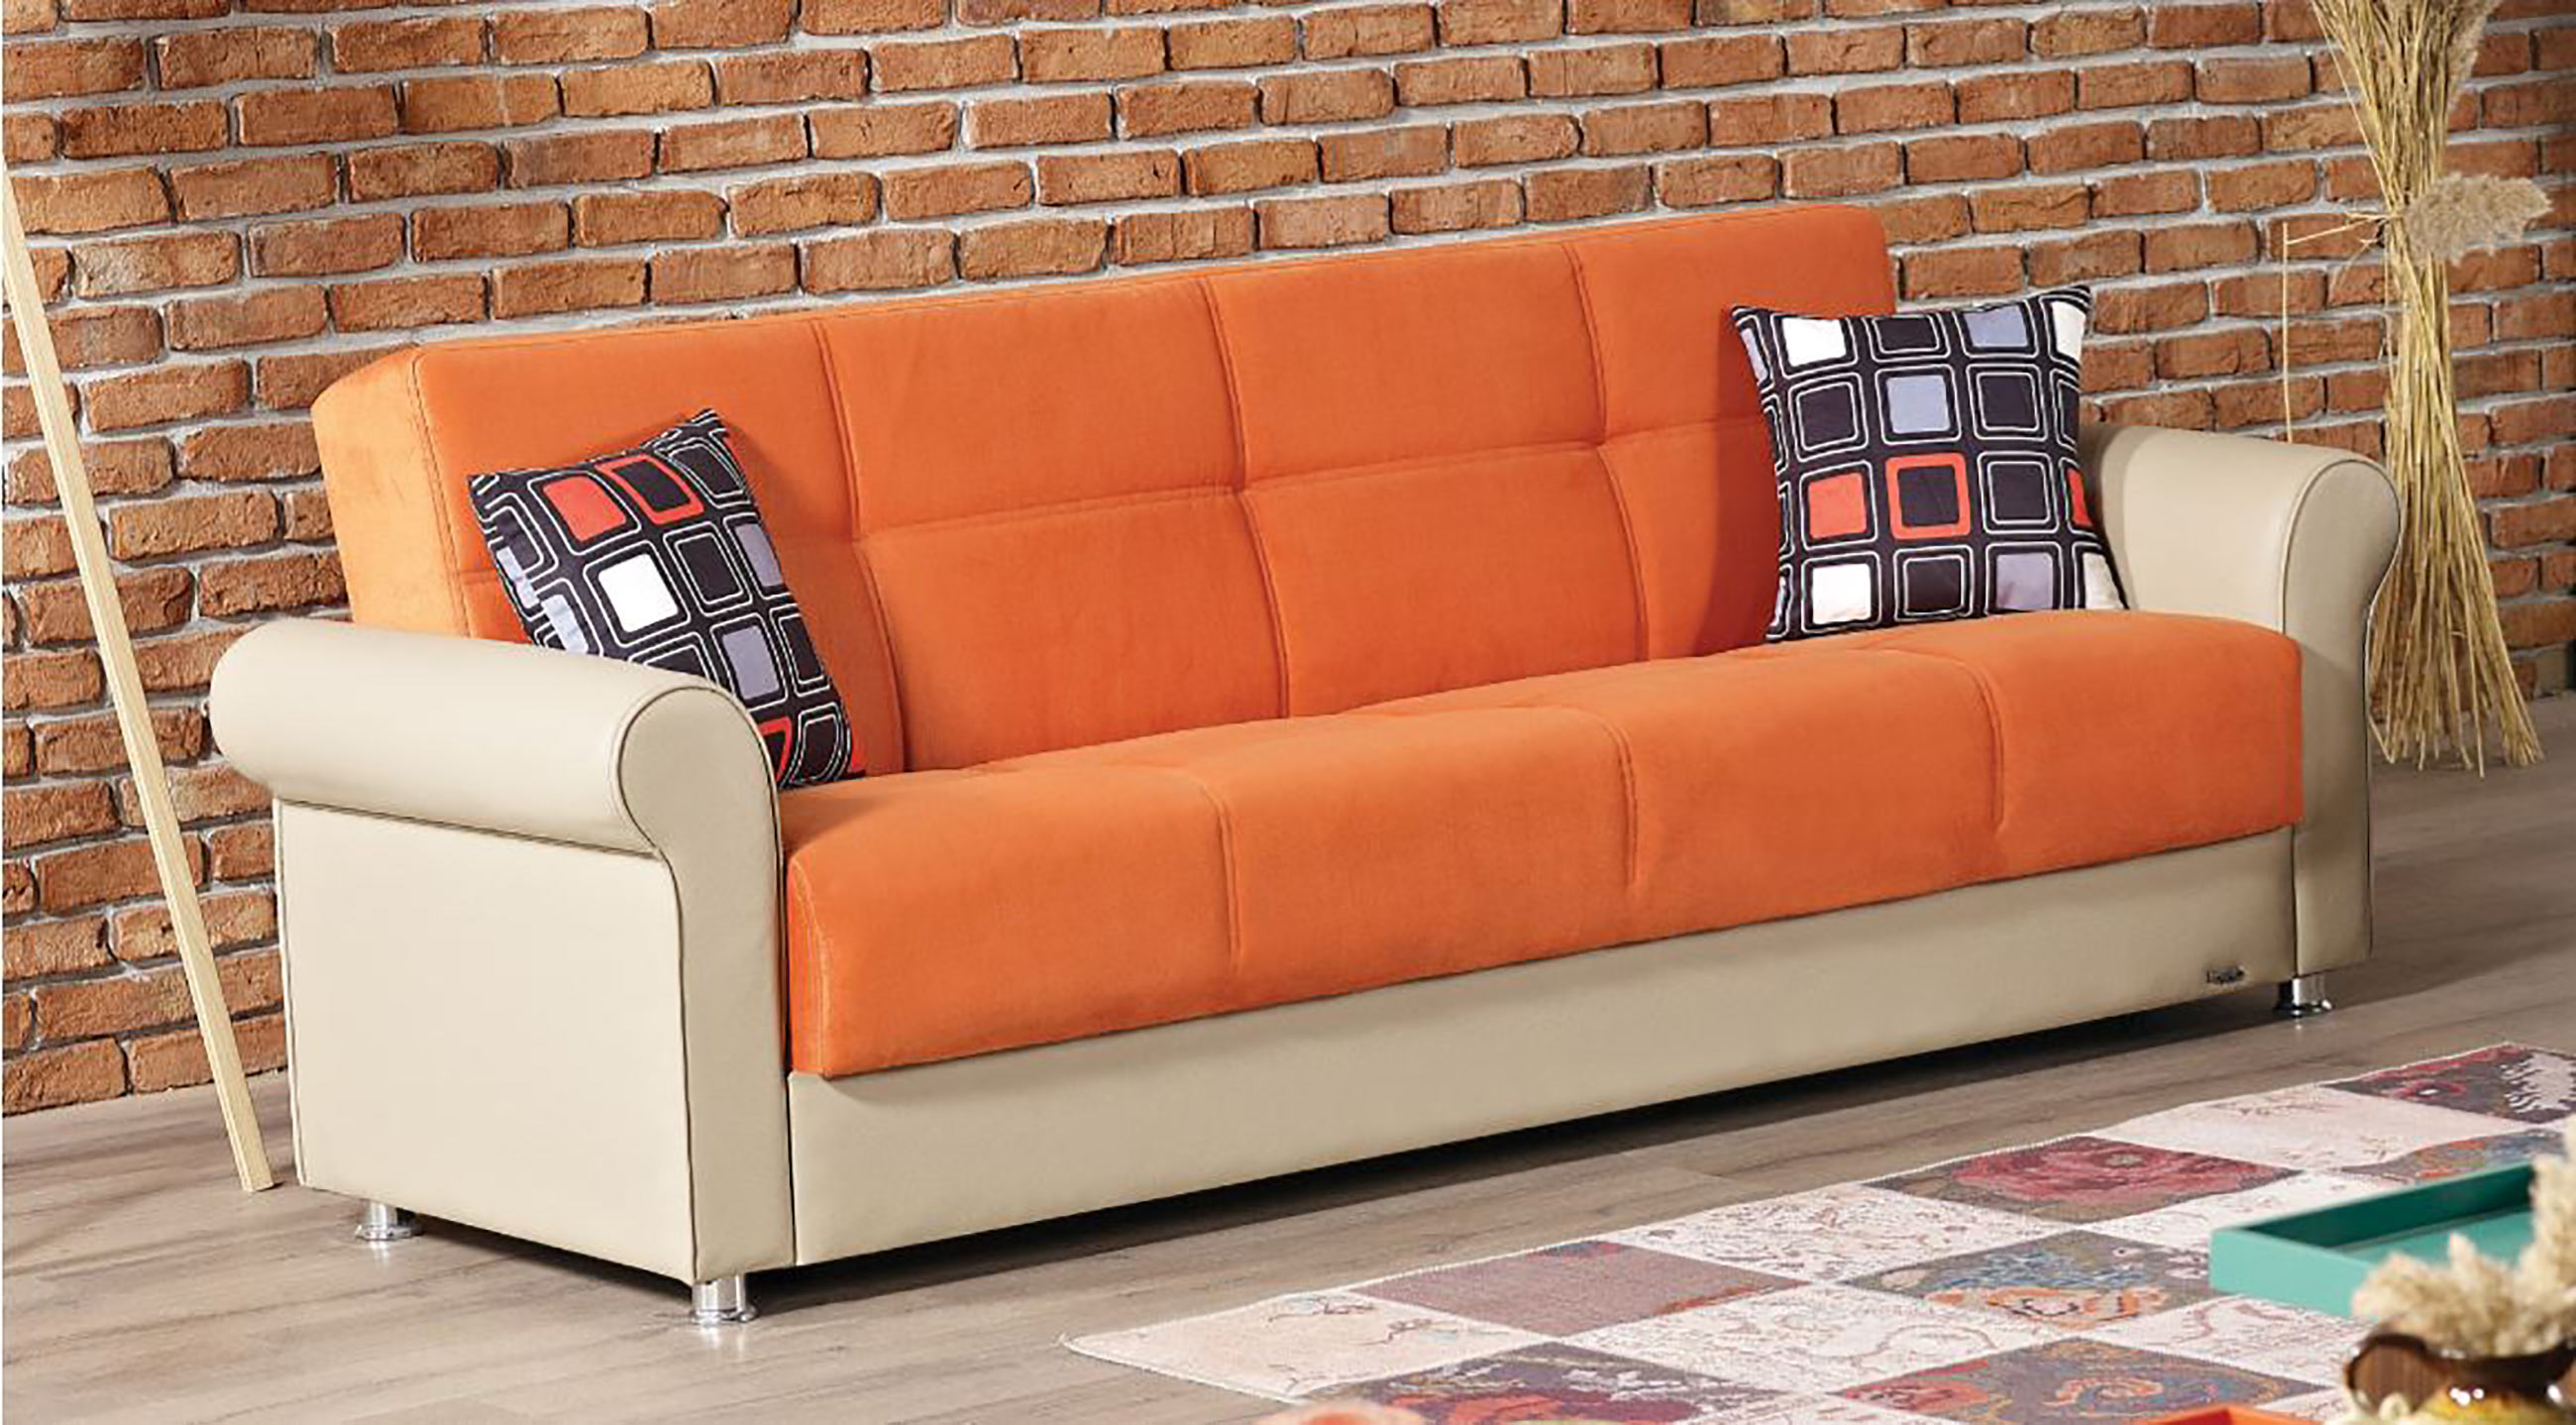 orange sofa bed sleigh loveseat fabric b tufty time corner clic